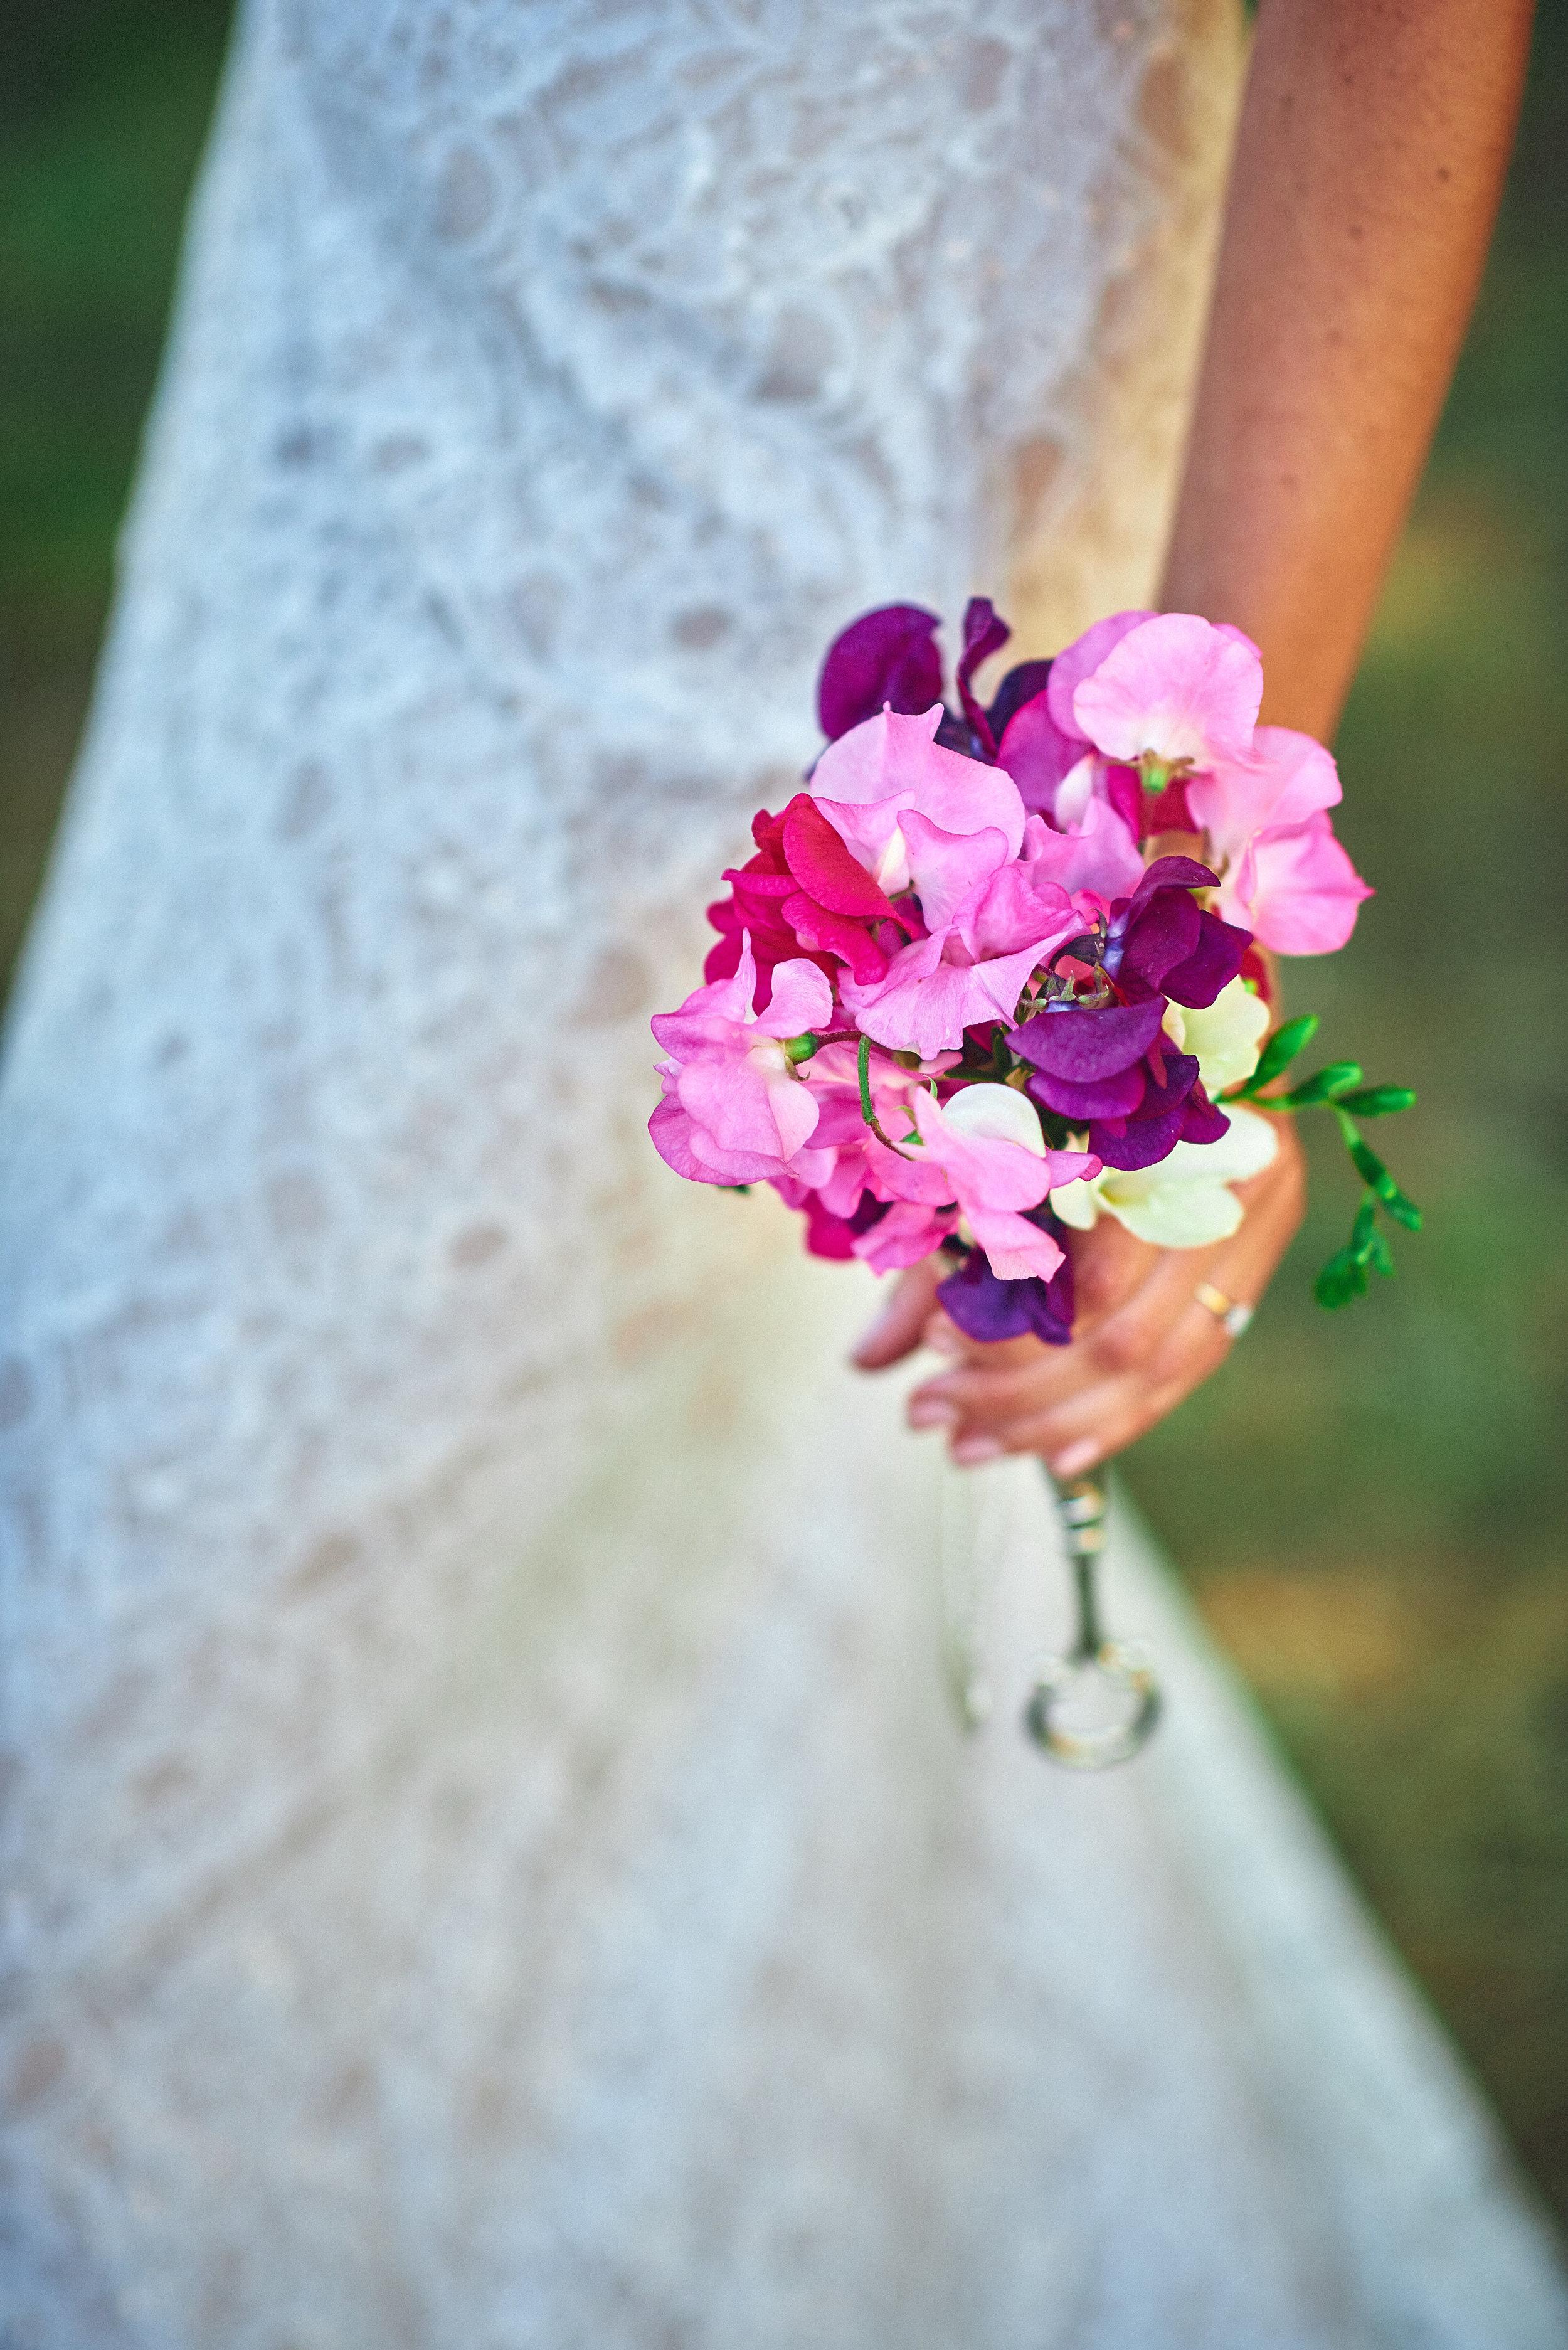 local pea flowers and handmade dress at plum nelli farm wedding.jpg